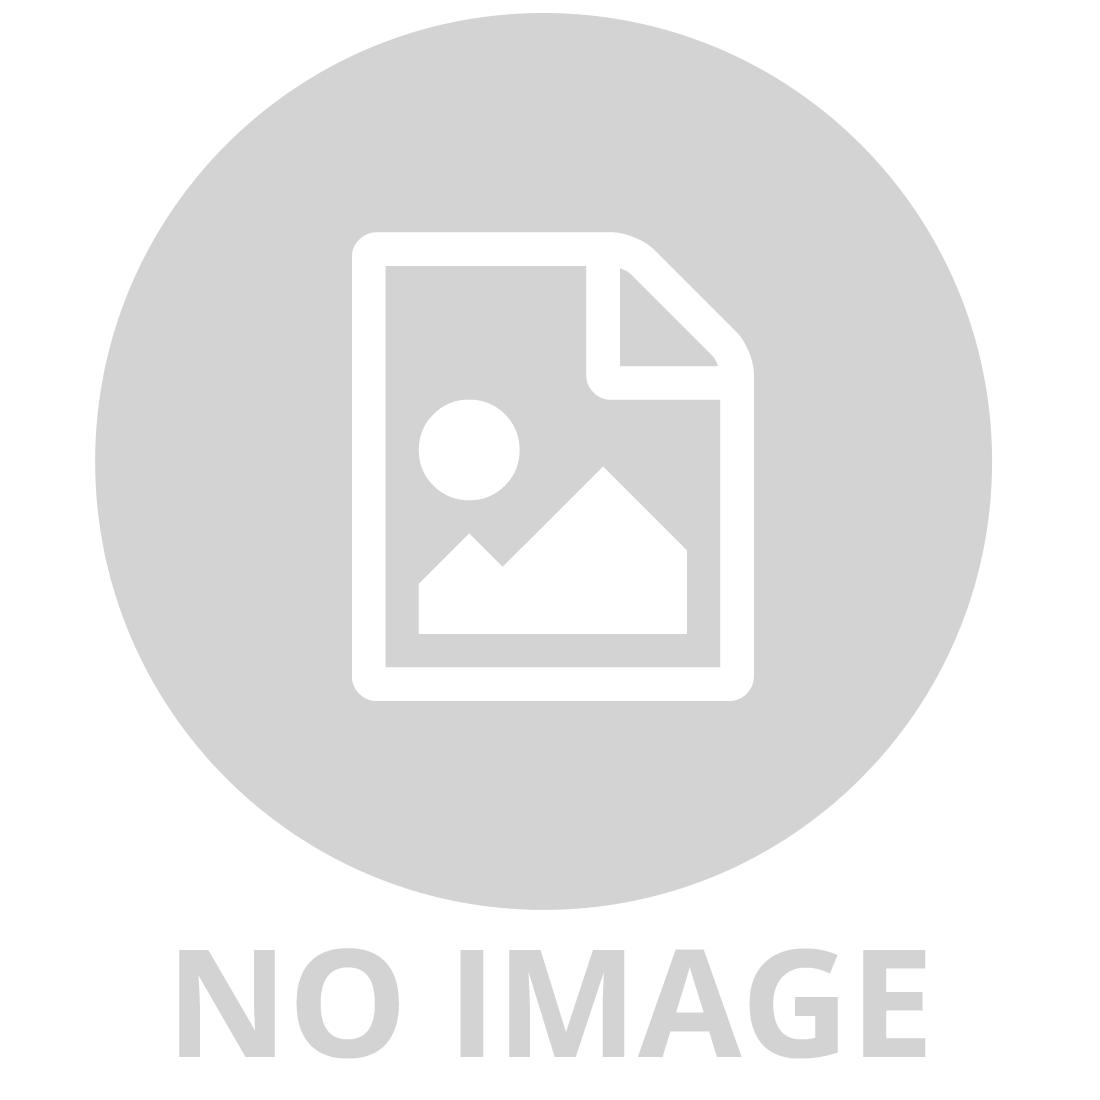 LEGO NINJAGO 70667 KIA'S BLADE CYCLE & ZANE'S SNOWMOBILE